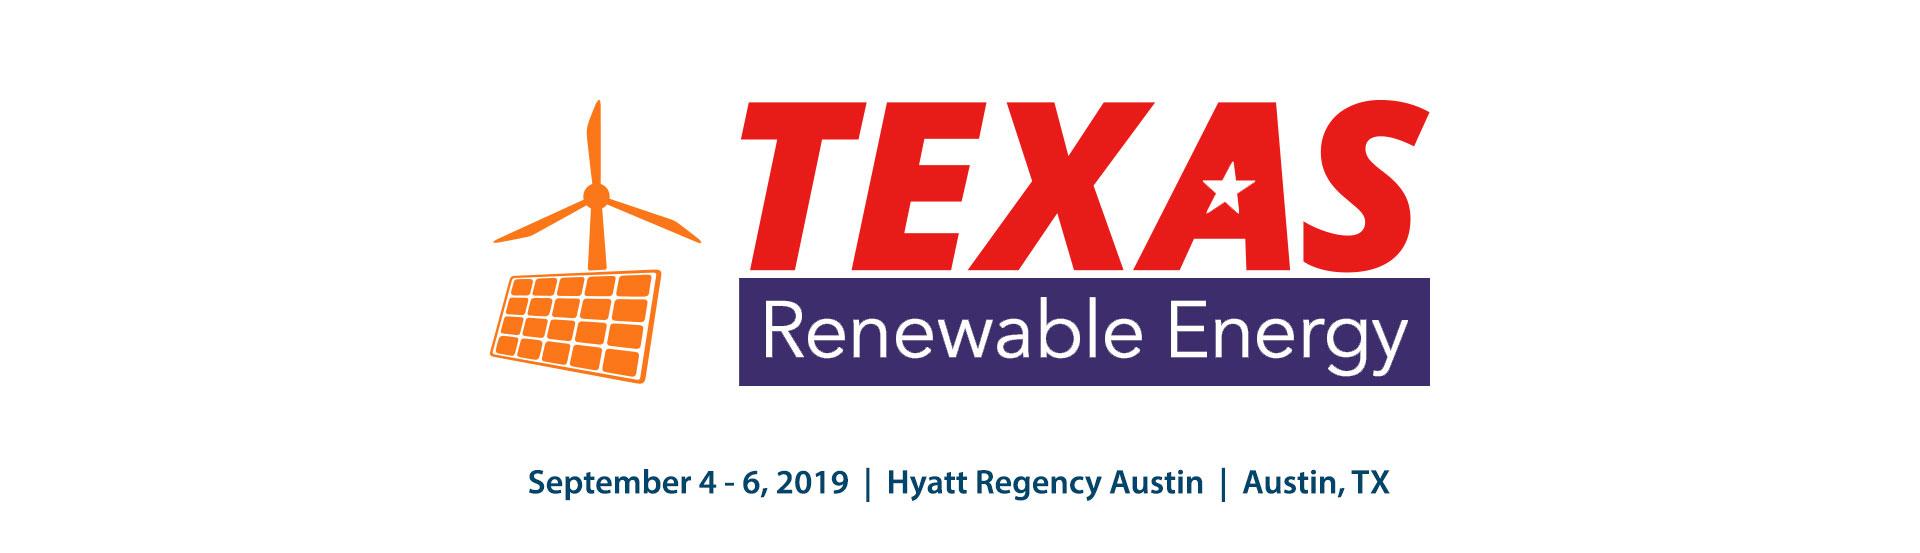 Texas Renewable Energy - Presented by Infocast